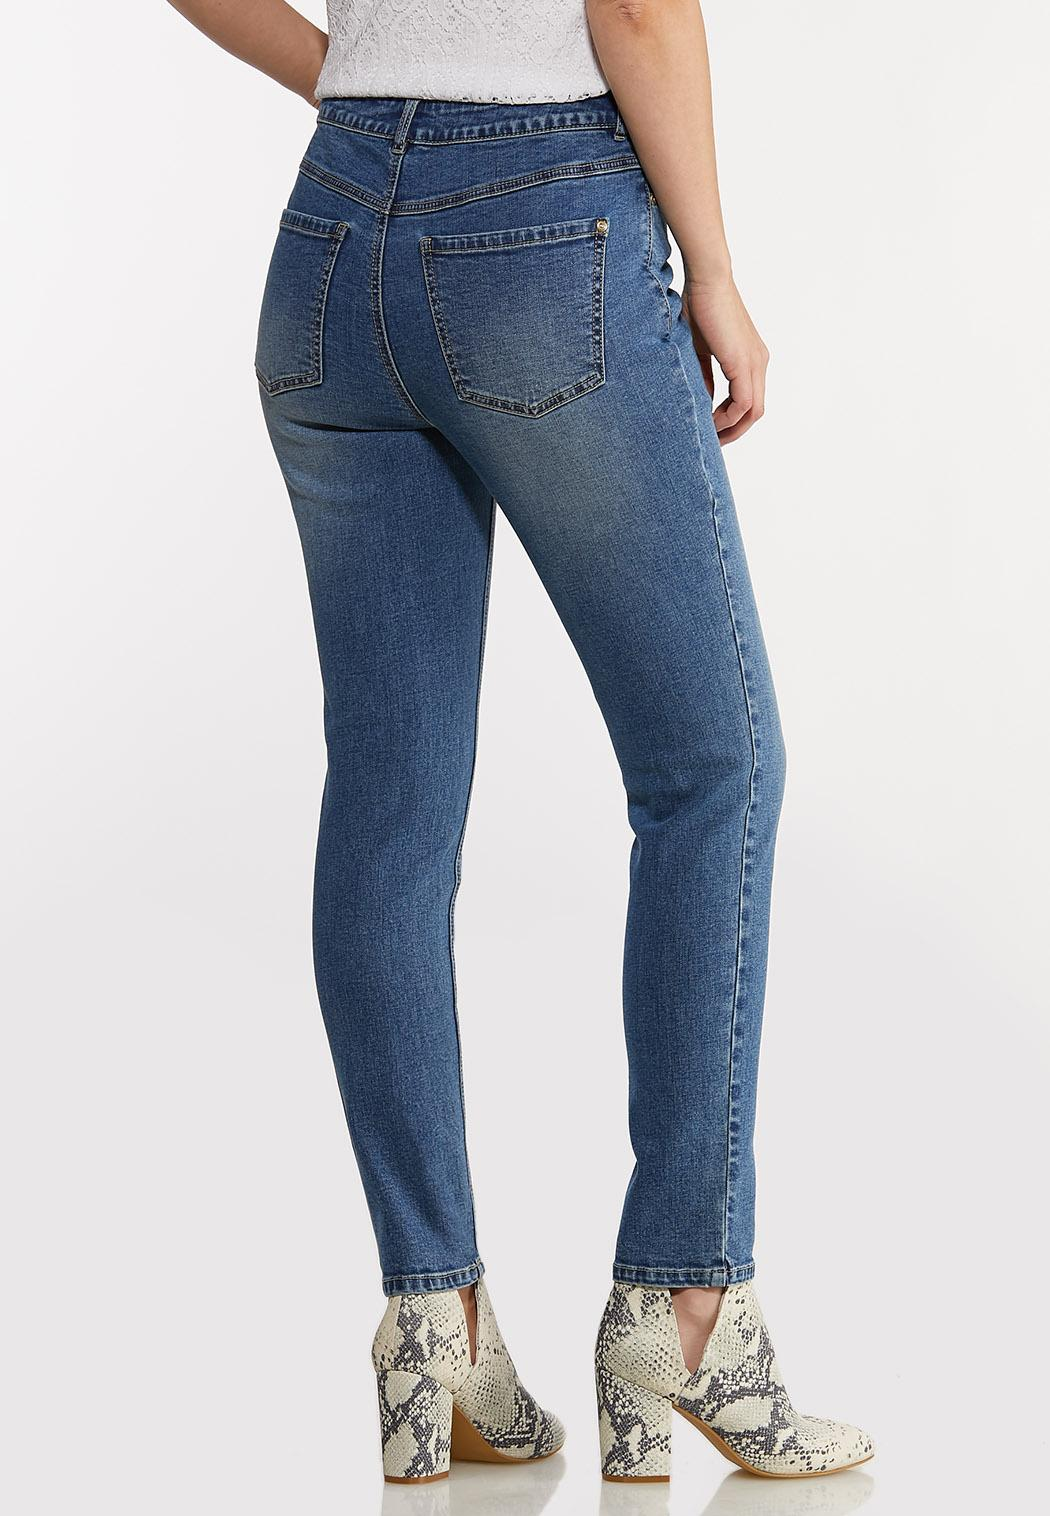 Mom Jeans (Item #44124999)